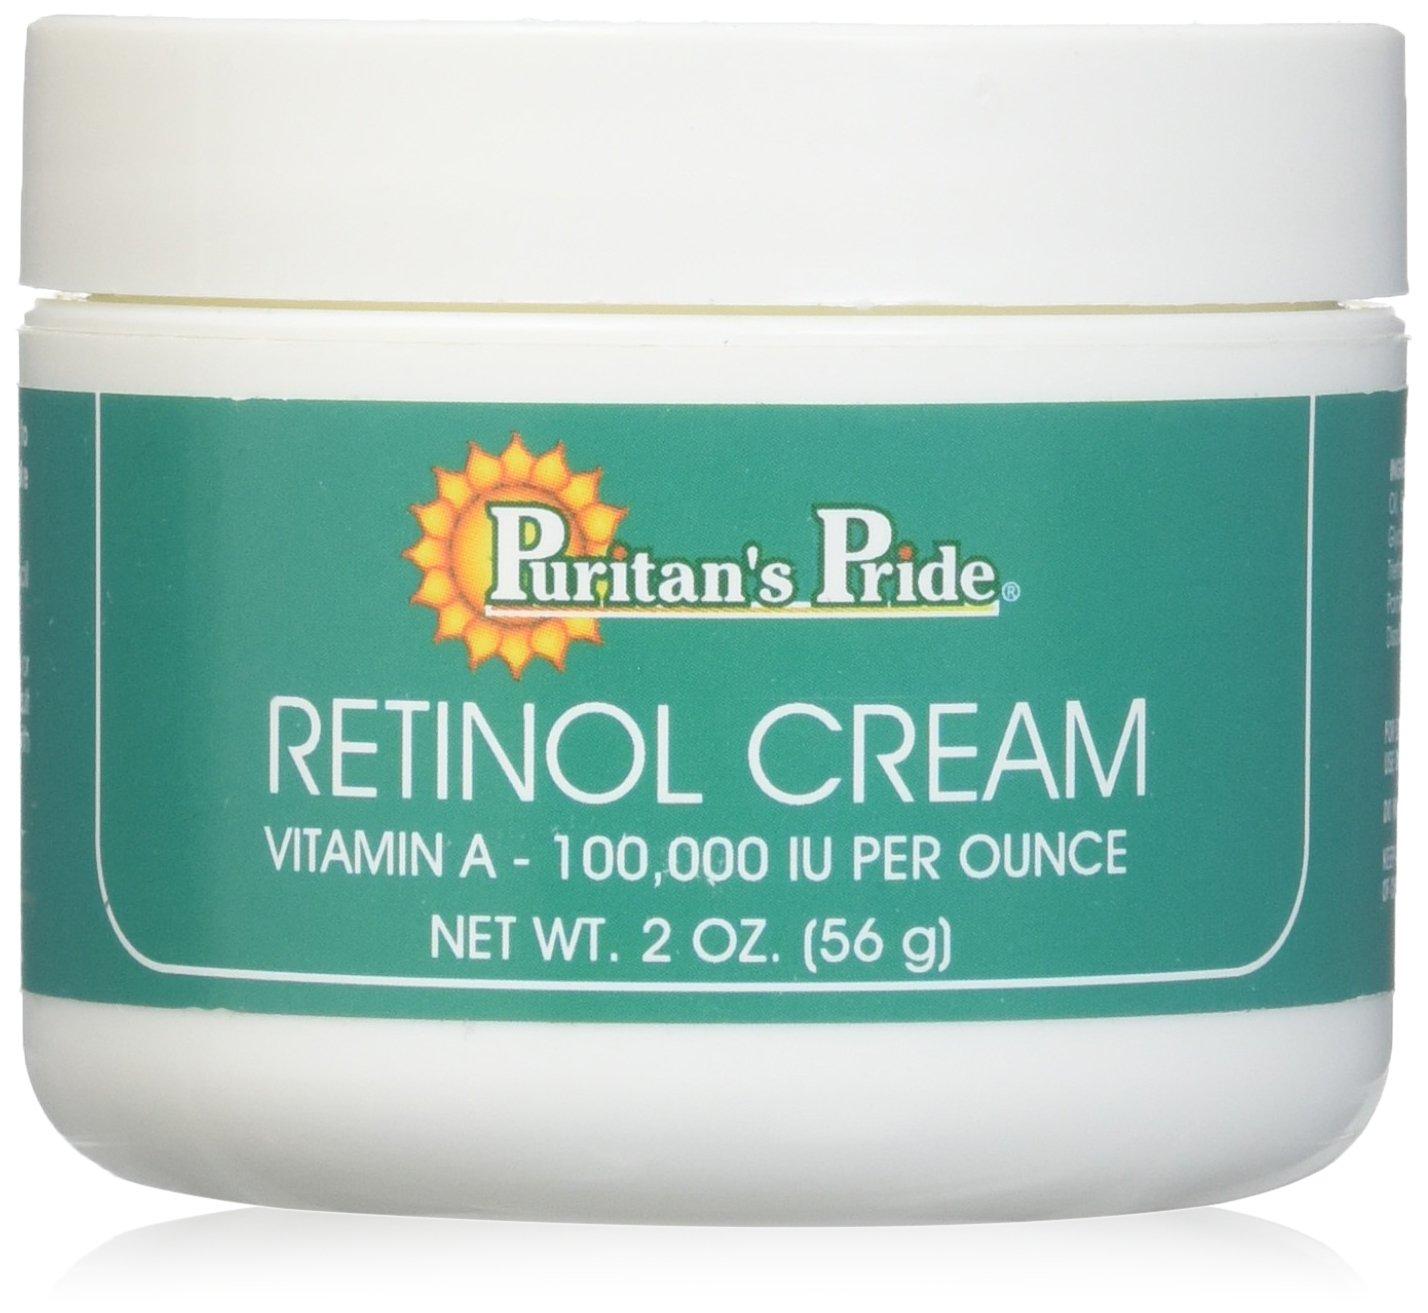 Retinol Cream 2 oz - Vitamin A 100,000 IU per oz (3 Jars) (3 Jars)